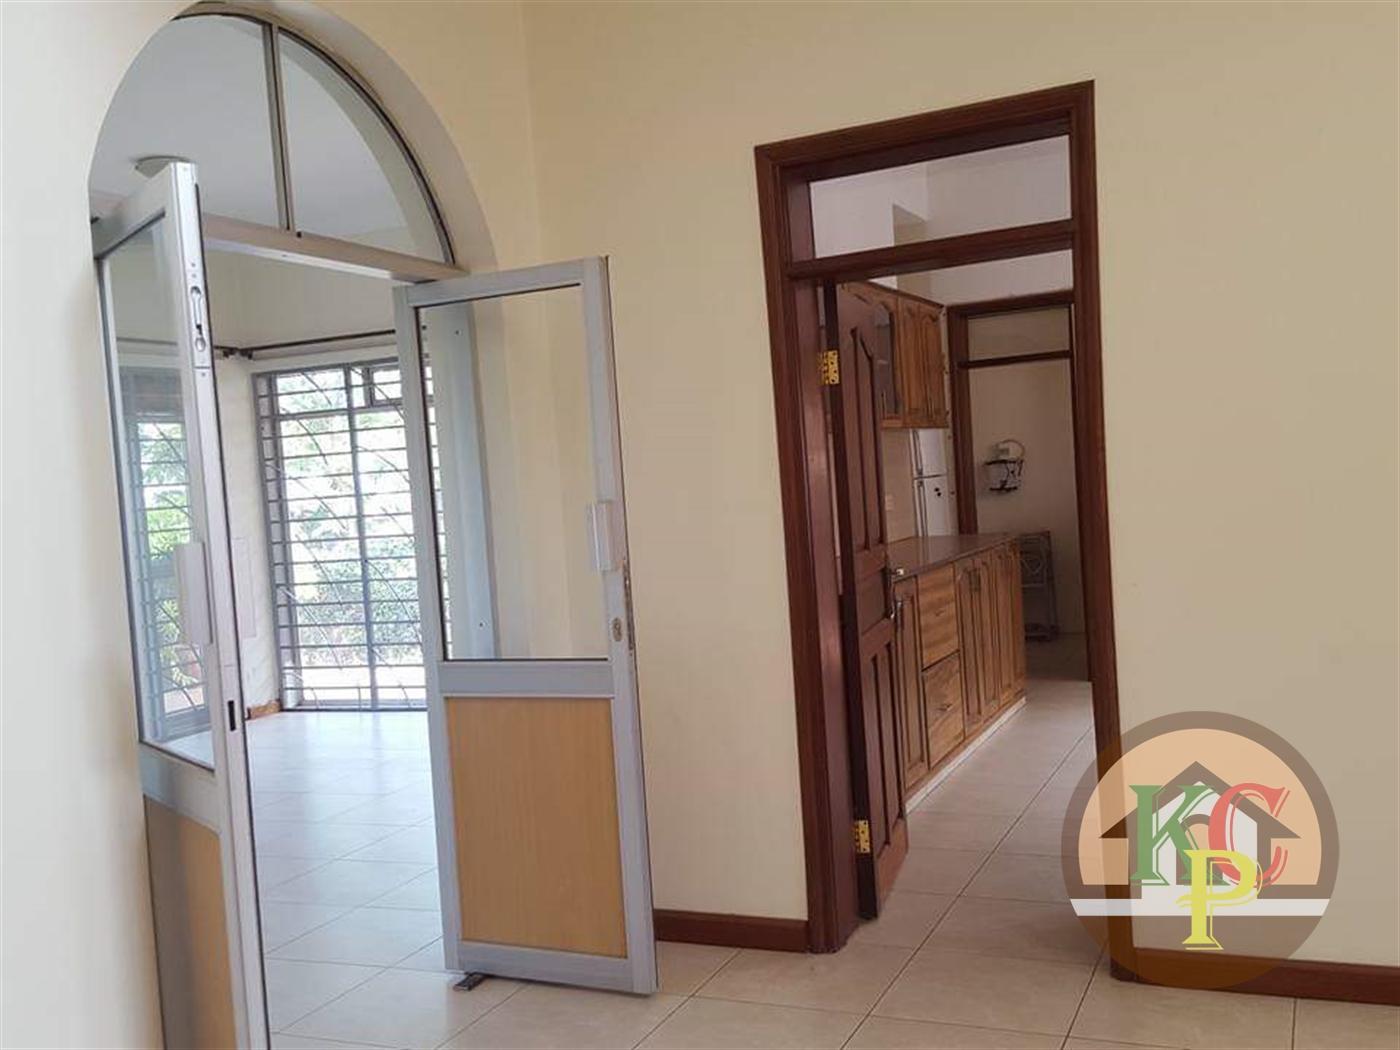 Mansion for rent in Naguru Kampala